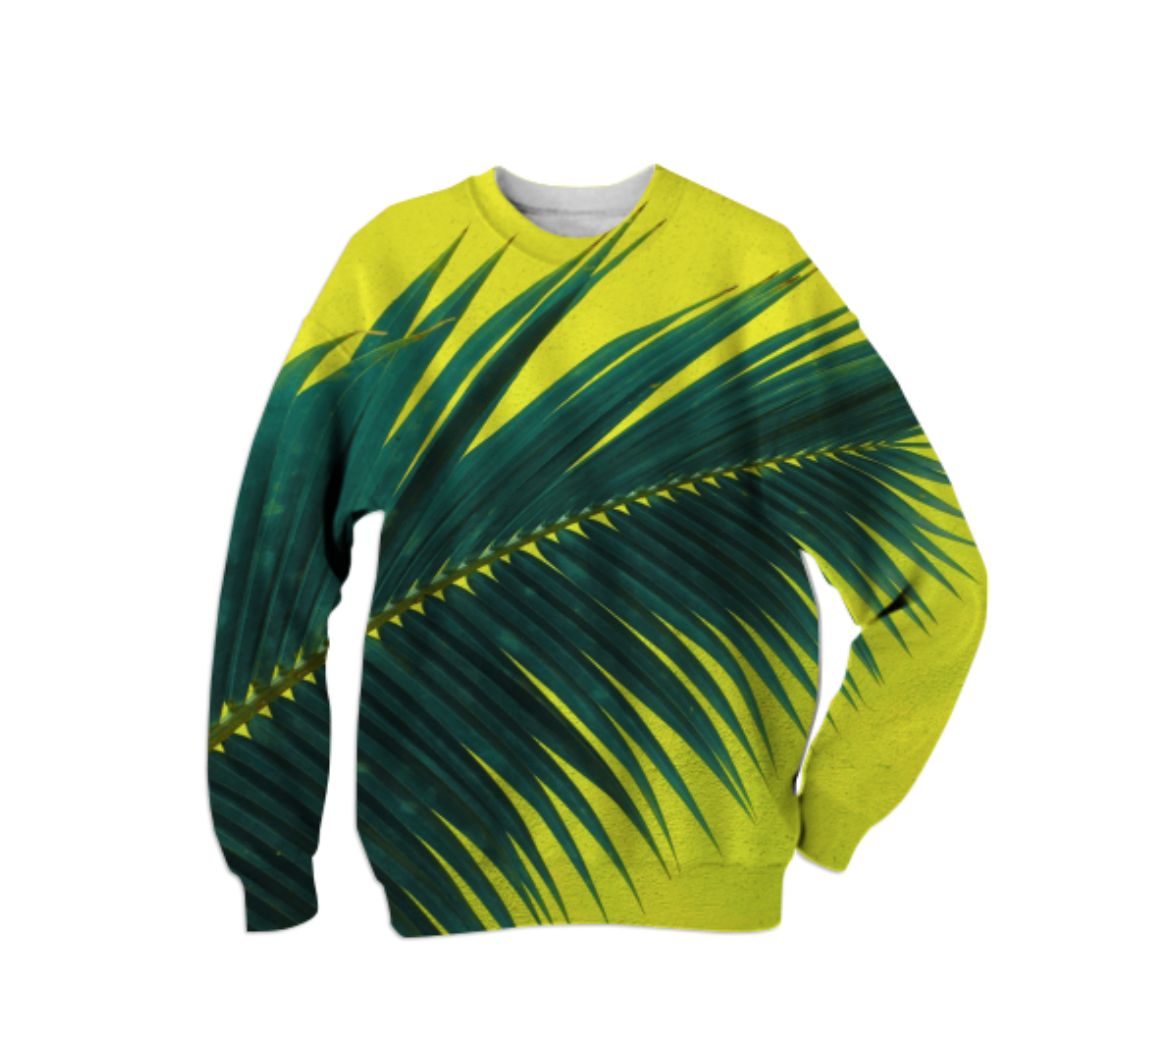 PALMY SWEATSHIRT    Cotton Sweatshirt      Sixty Eight Dollars